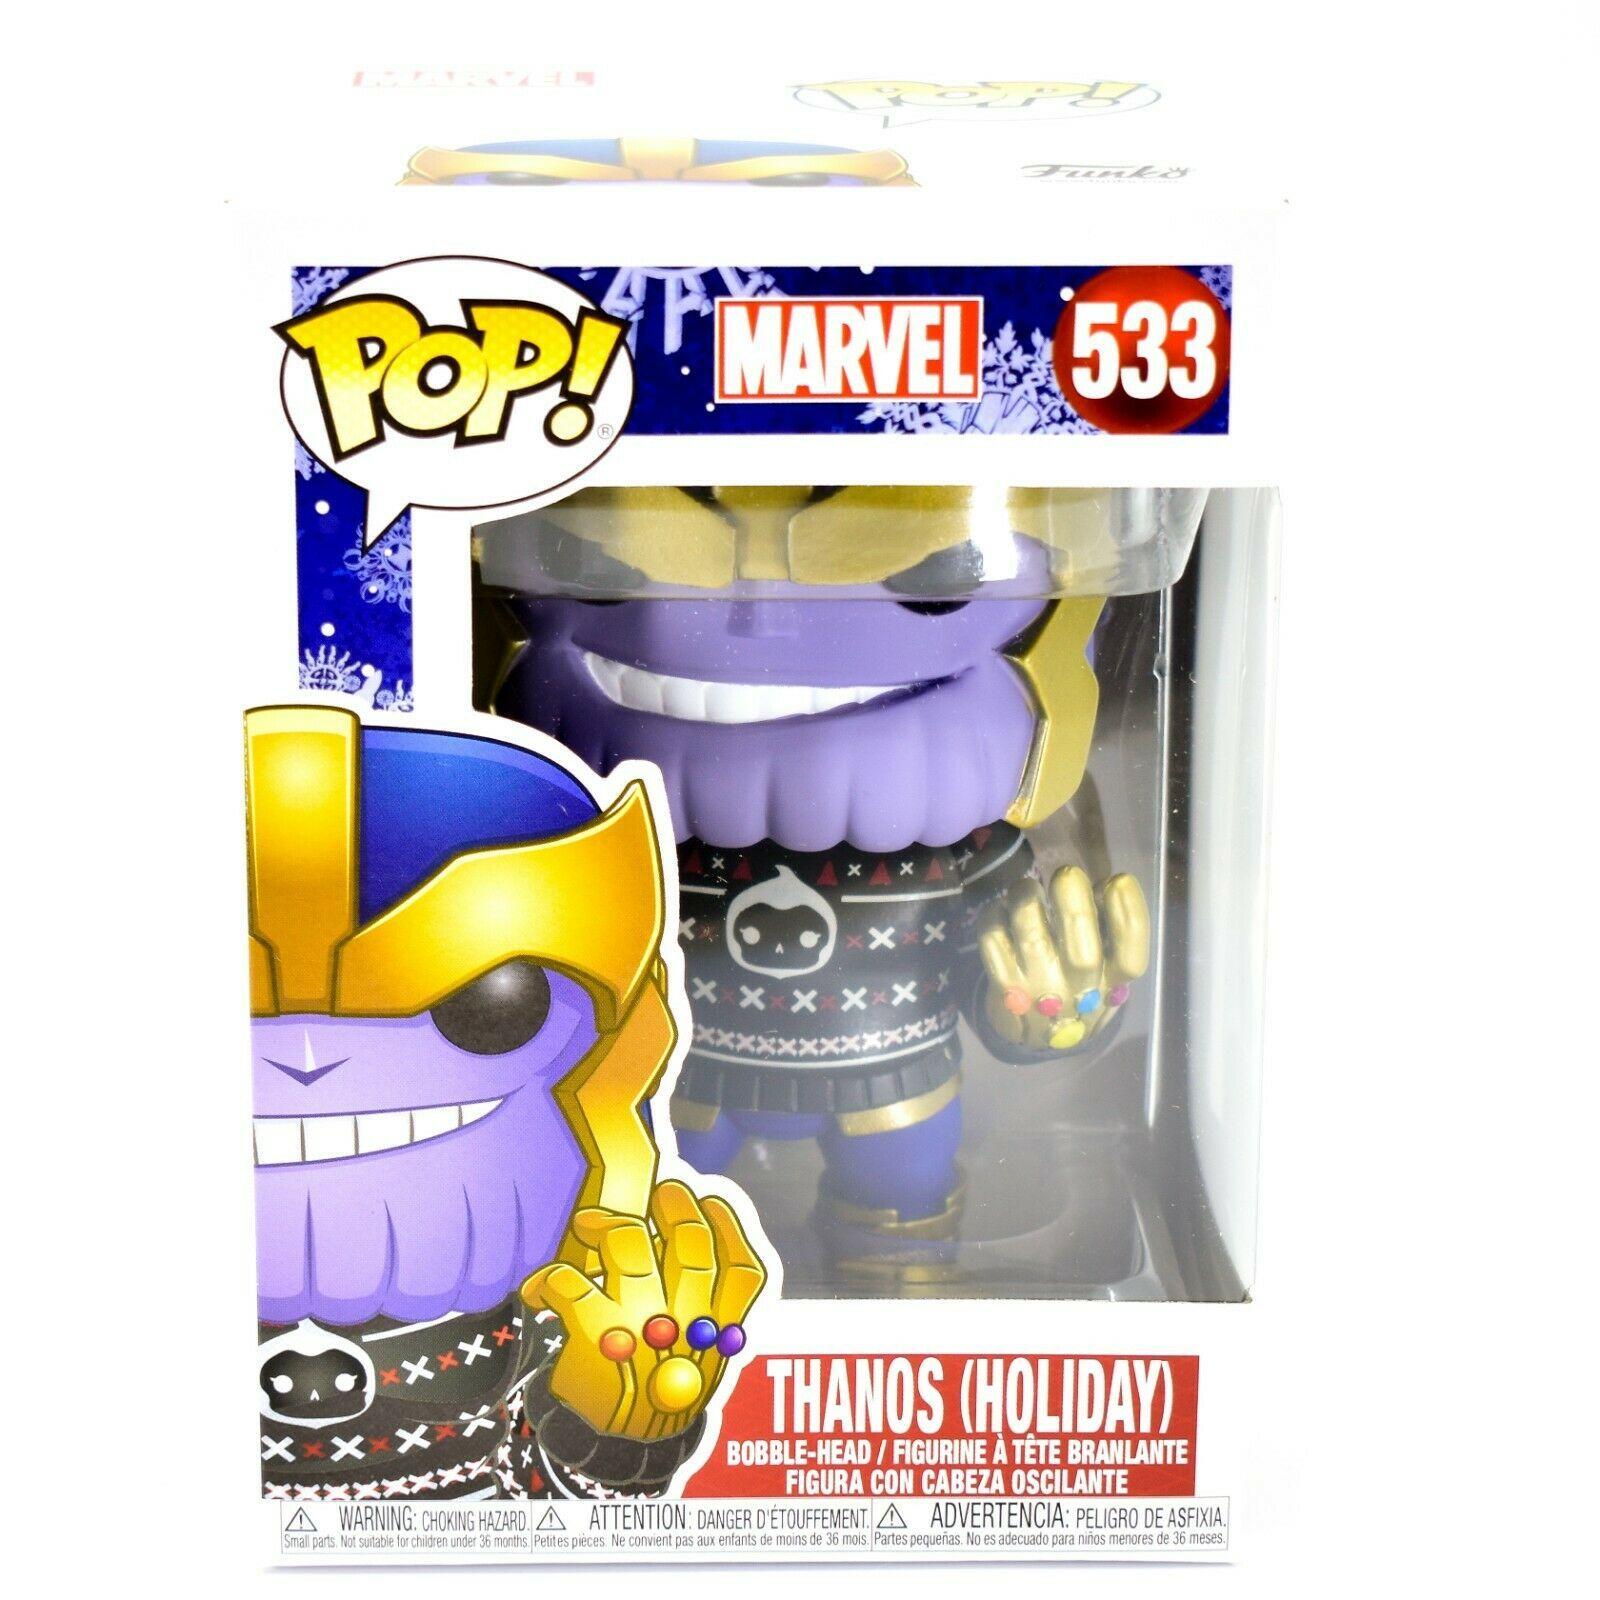 Funko Pop! Marvel Christmas Holiday Thanos #533 Vinyl Bobble-Head